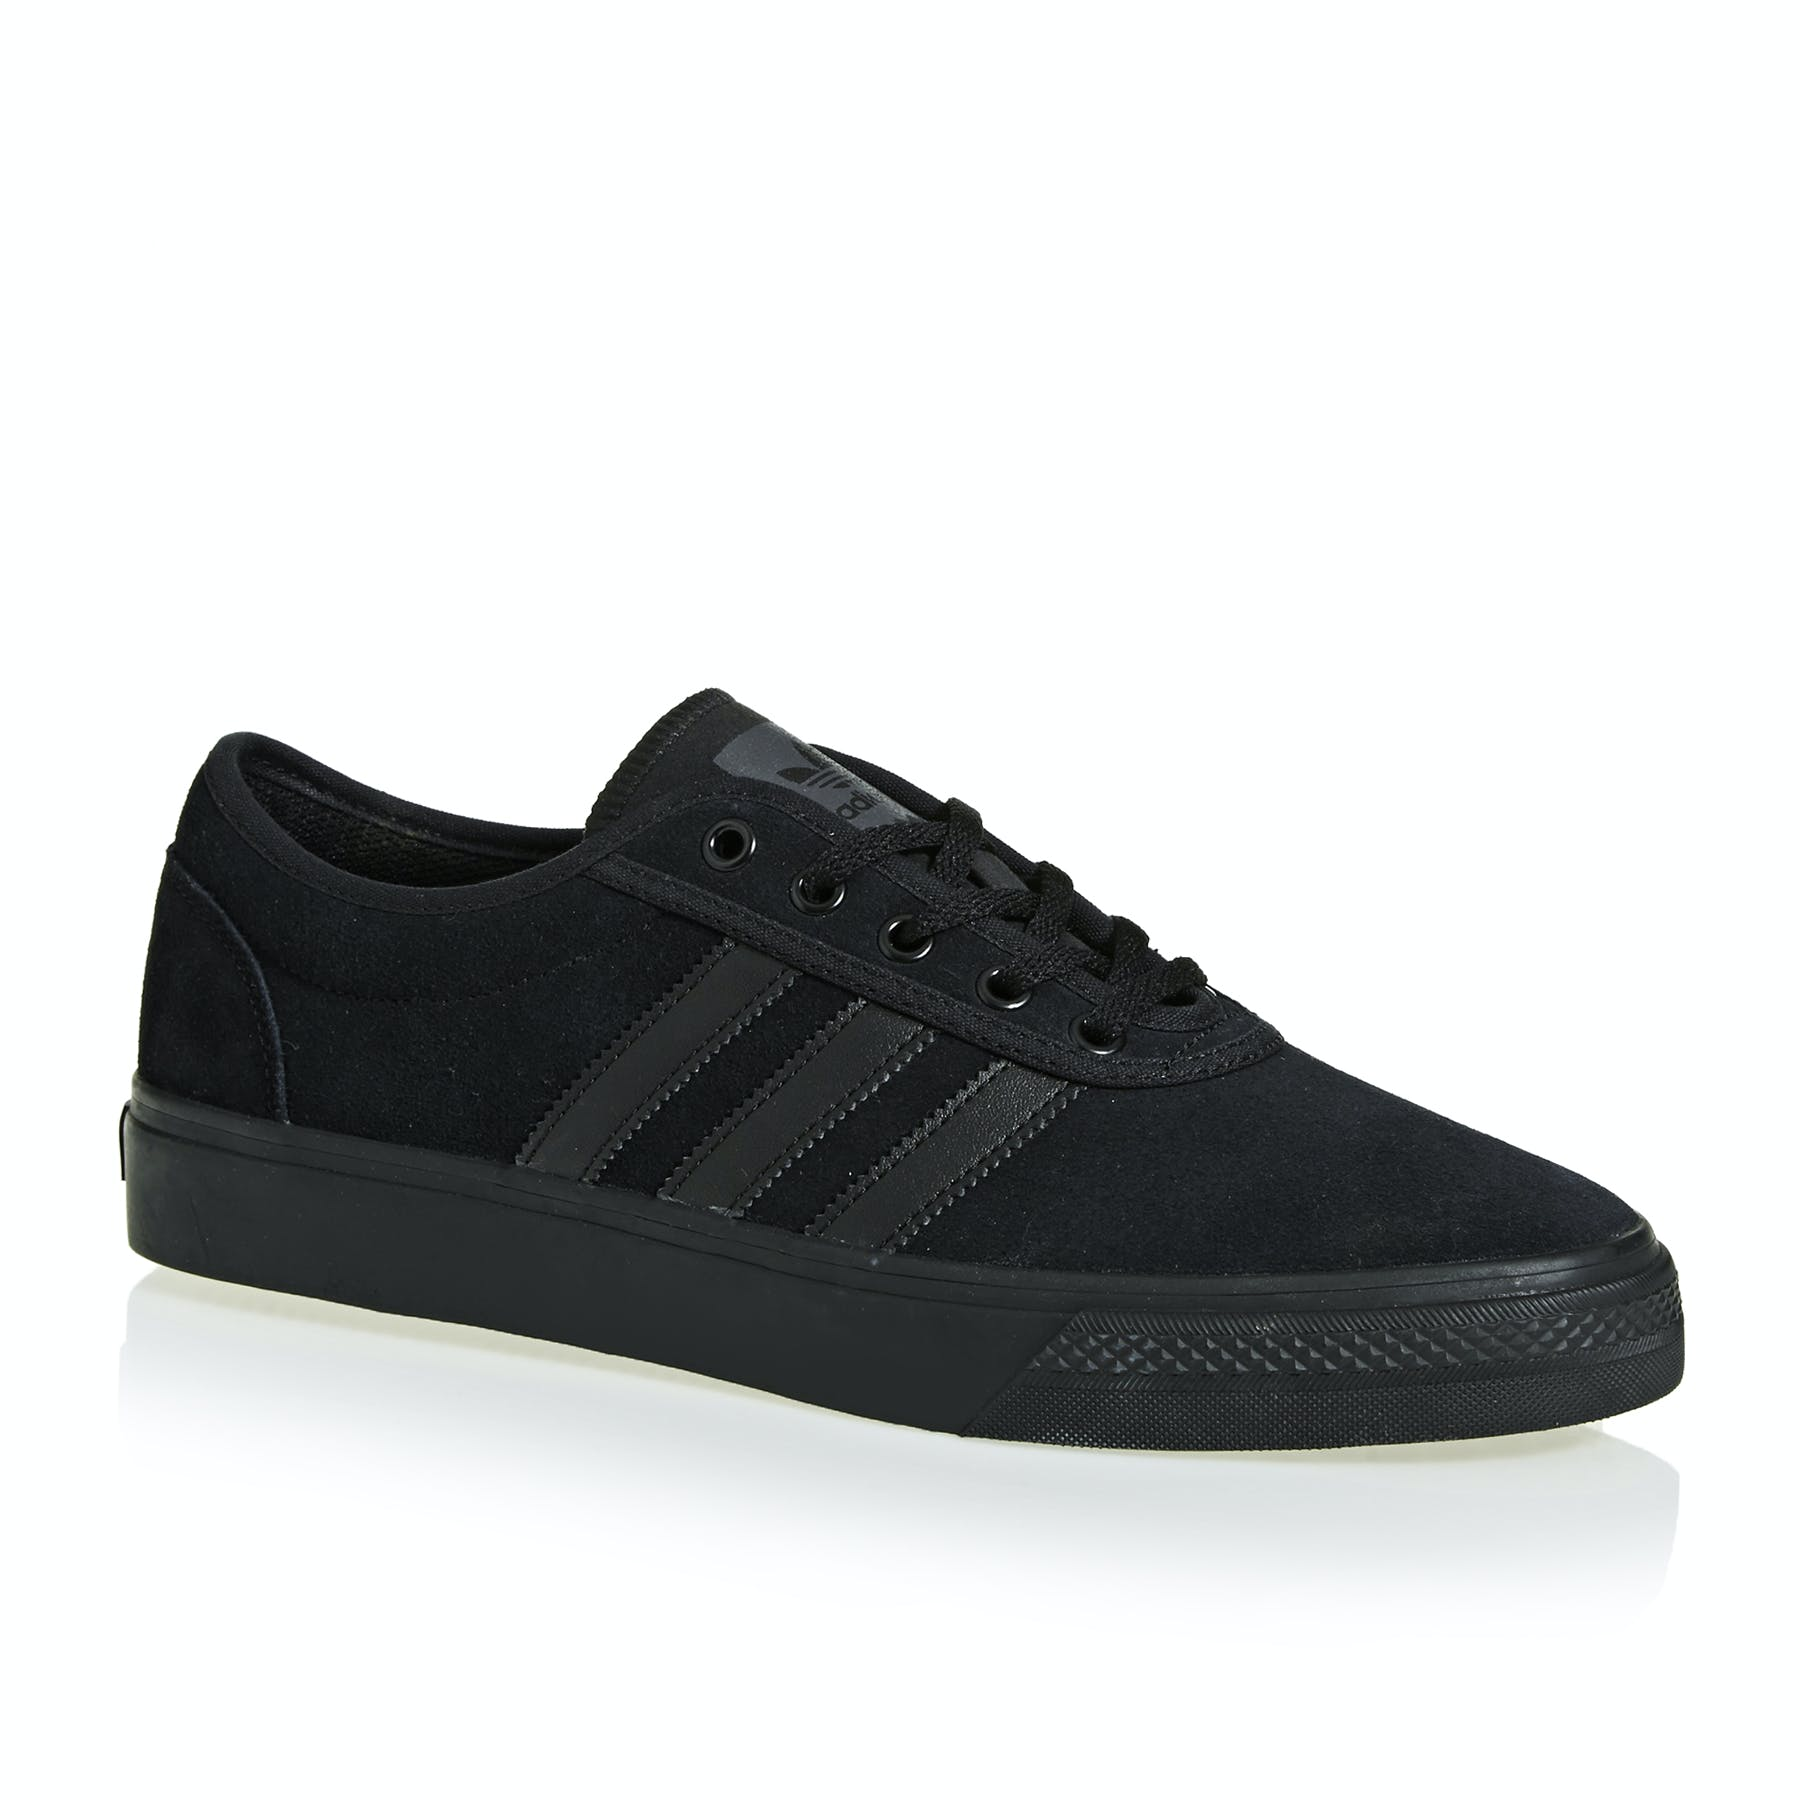 Adidas Adi Ease Shoes